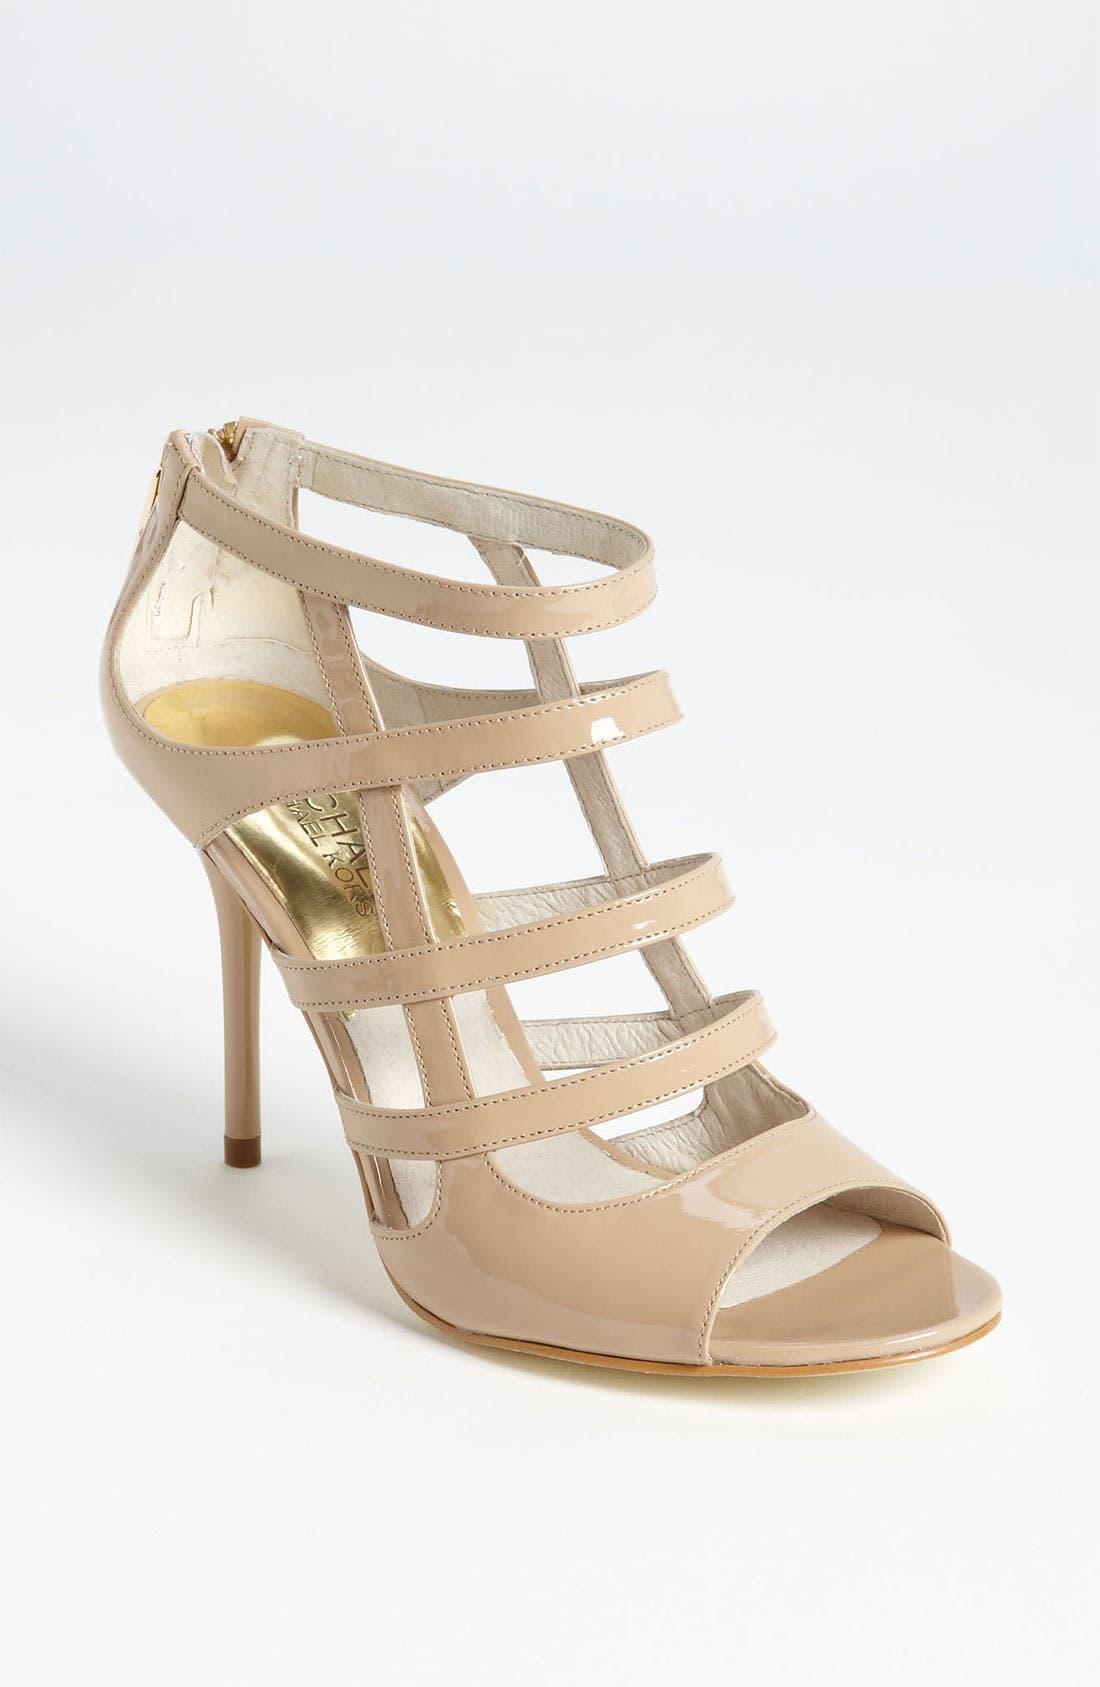 Main Image - MICHAEL Michael Kors 'Jessie' Sandal